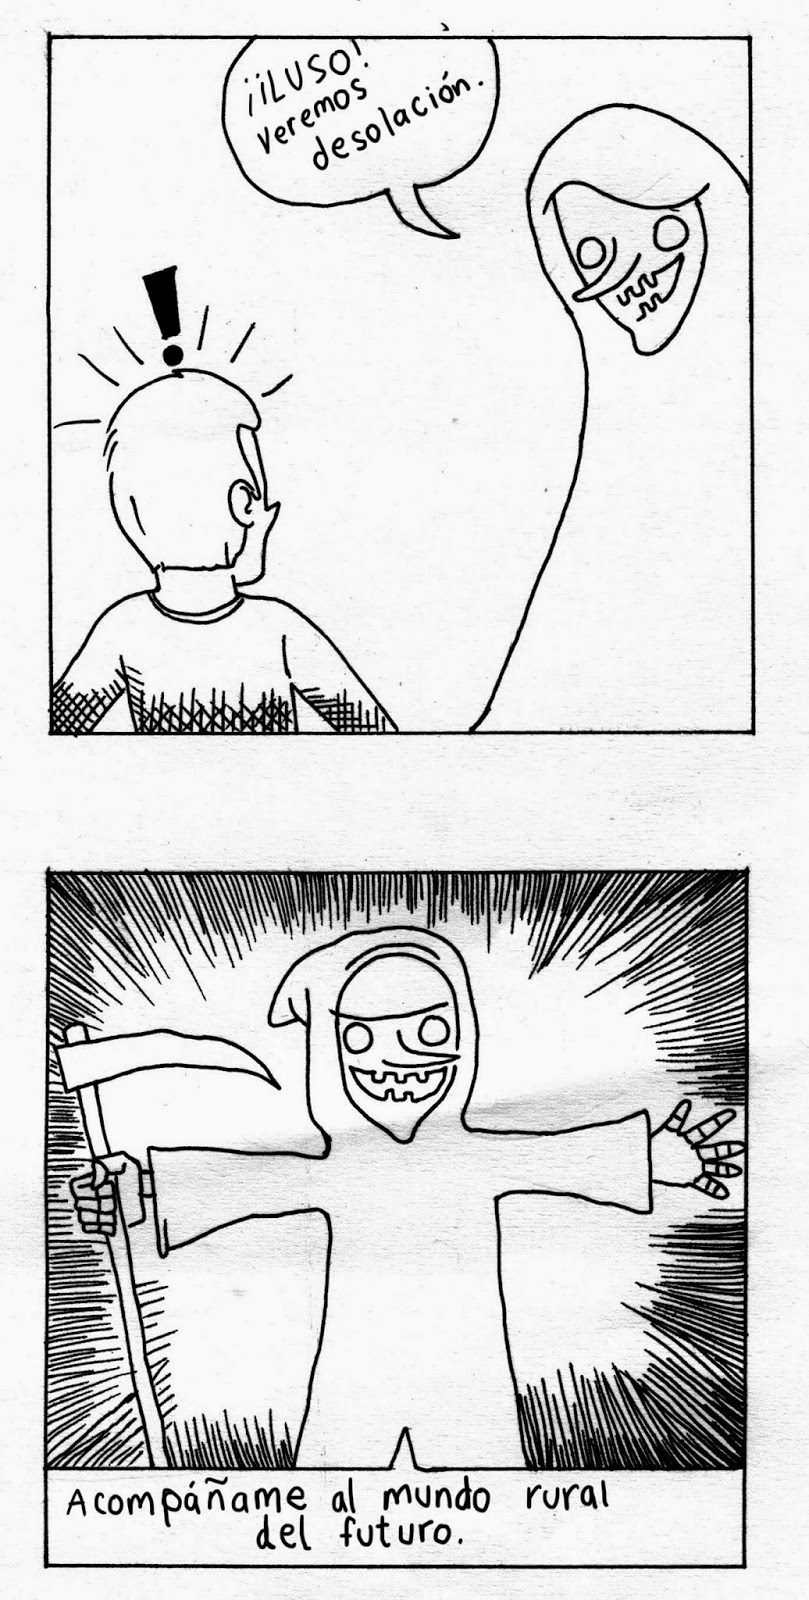 comic-juan-manuel-santos